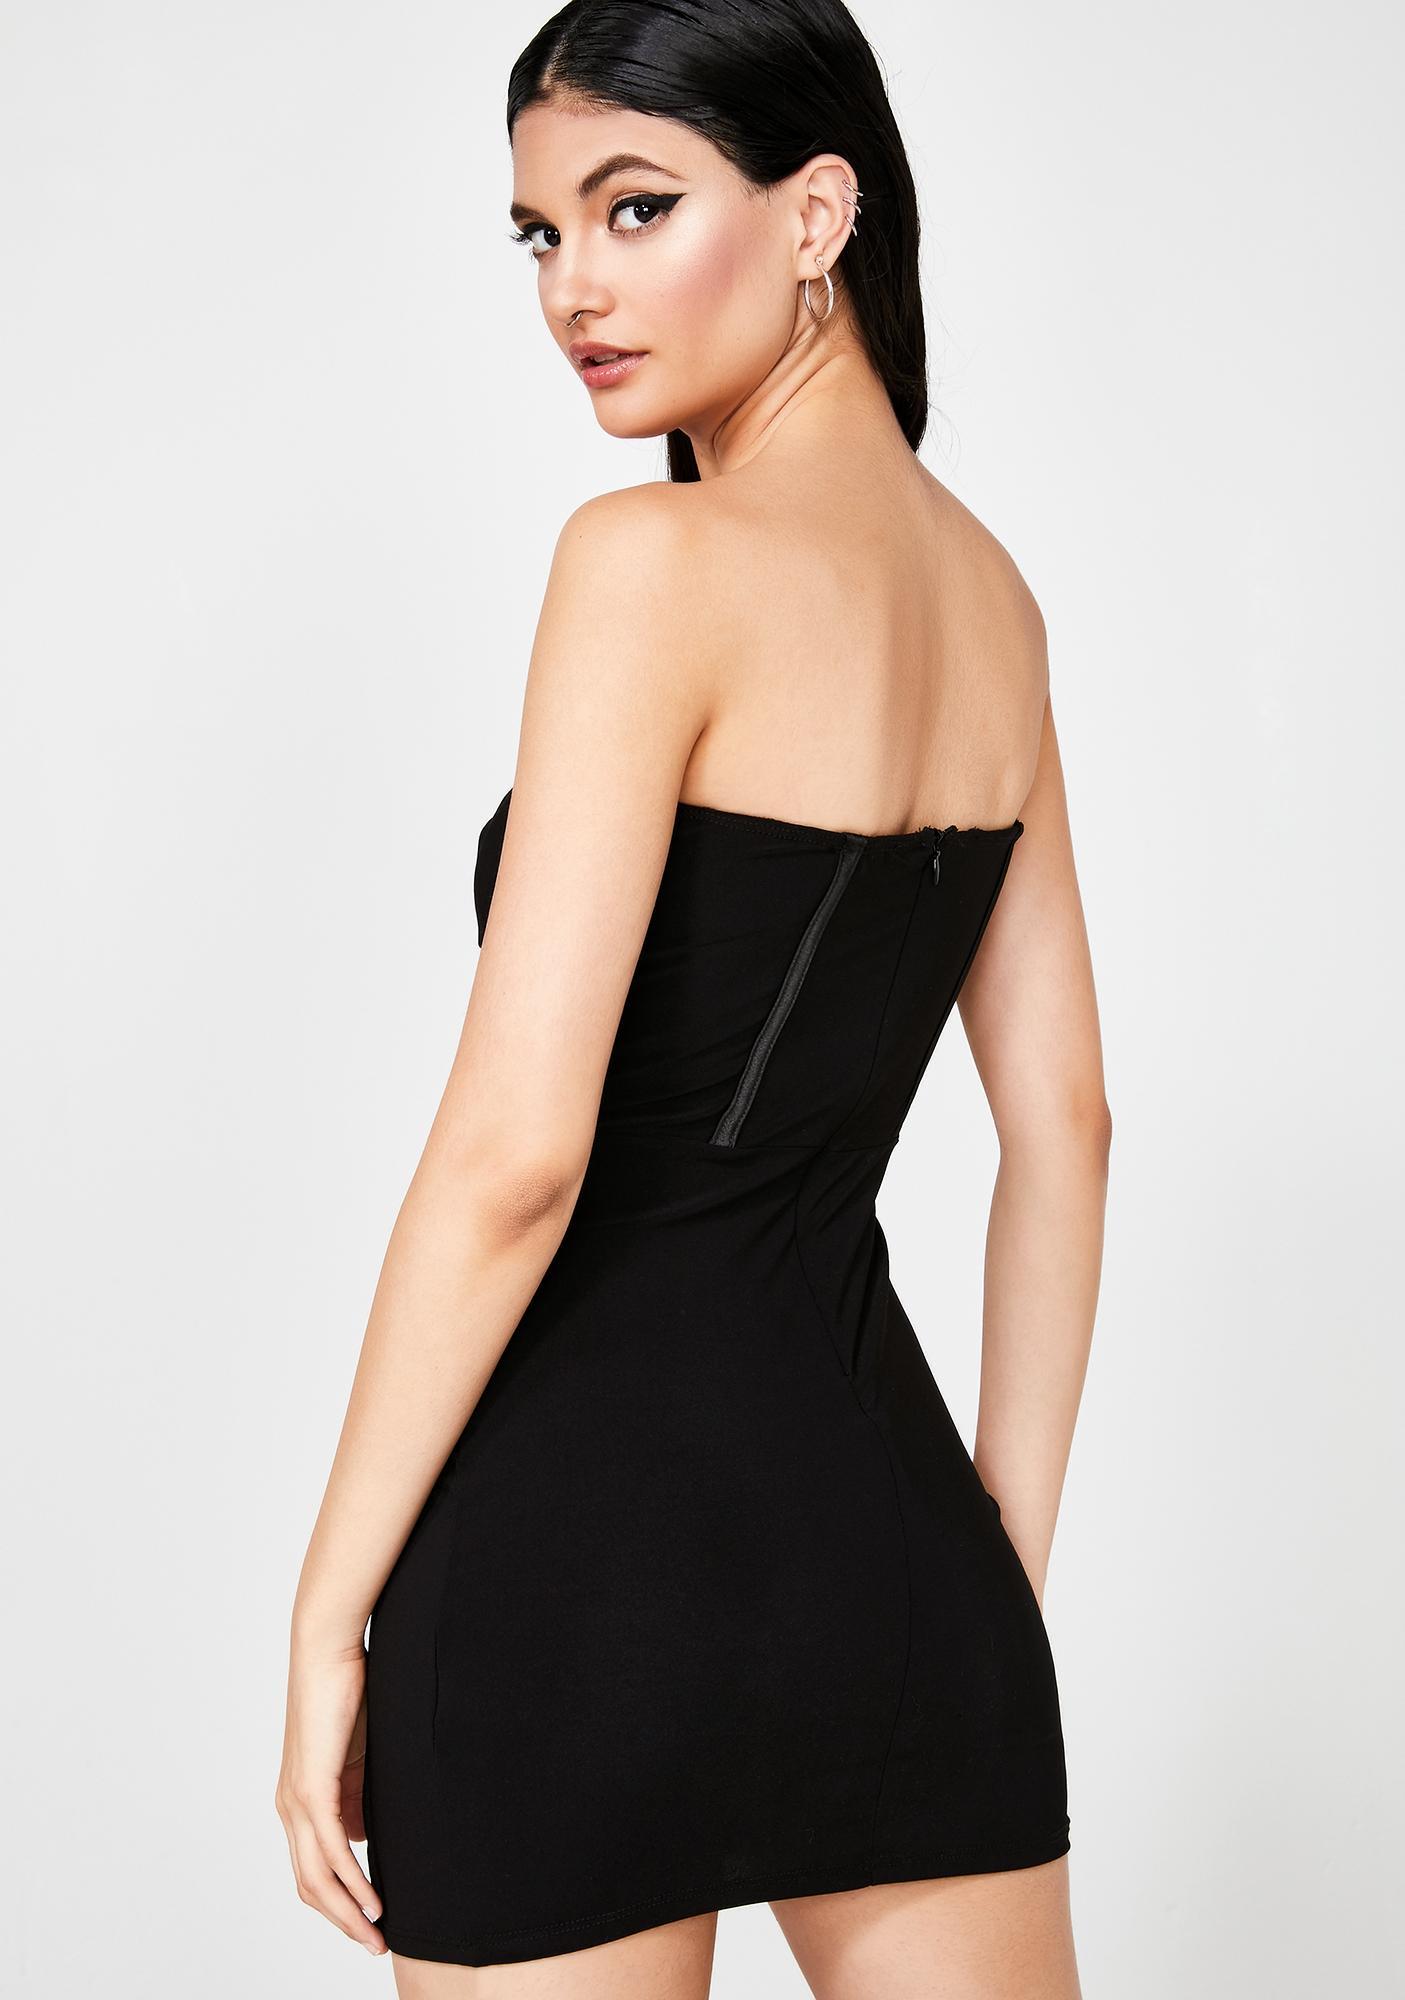 Baddie Zone Mini Dress